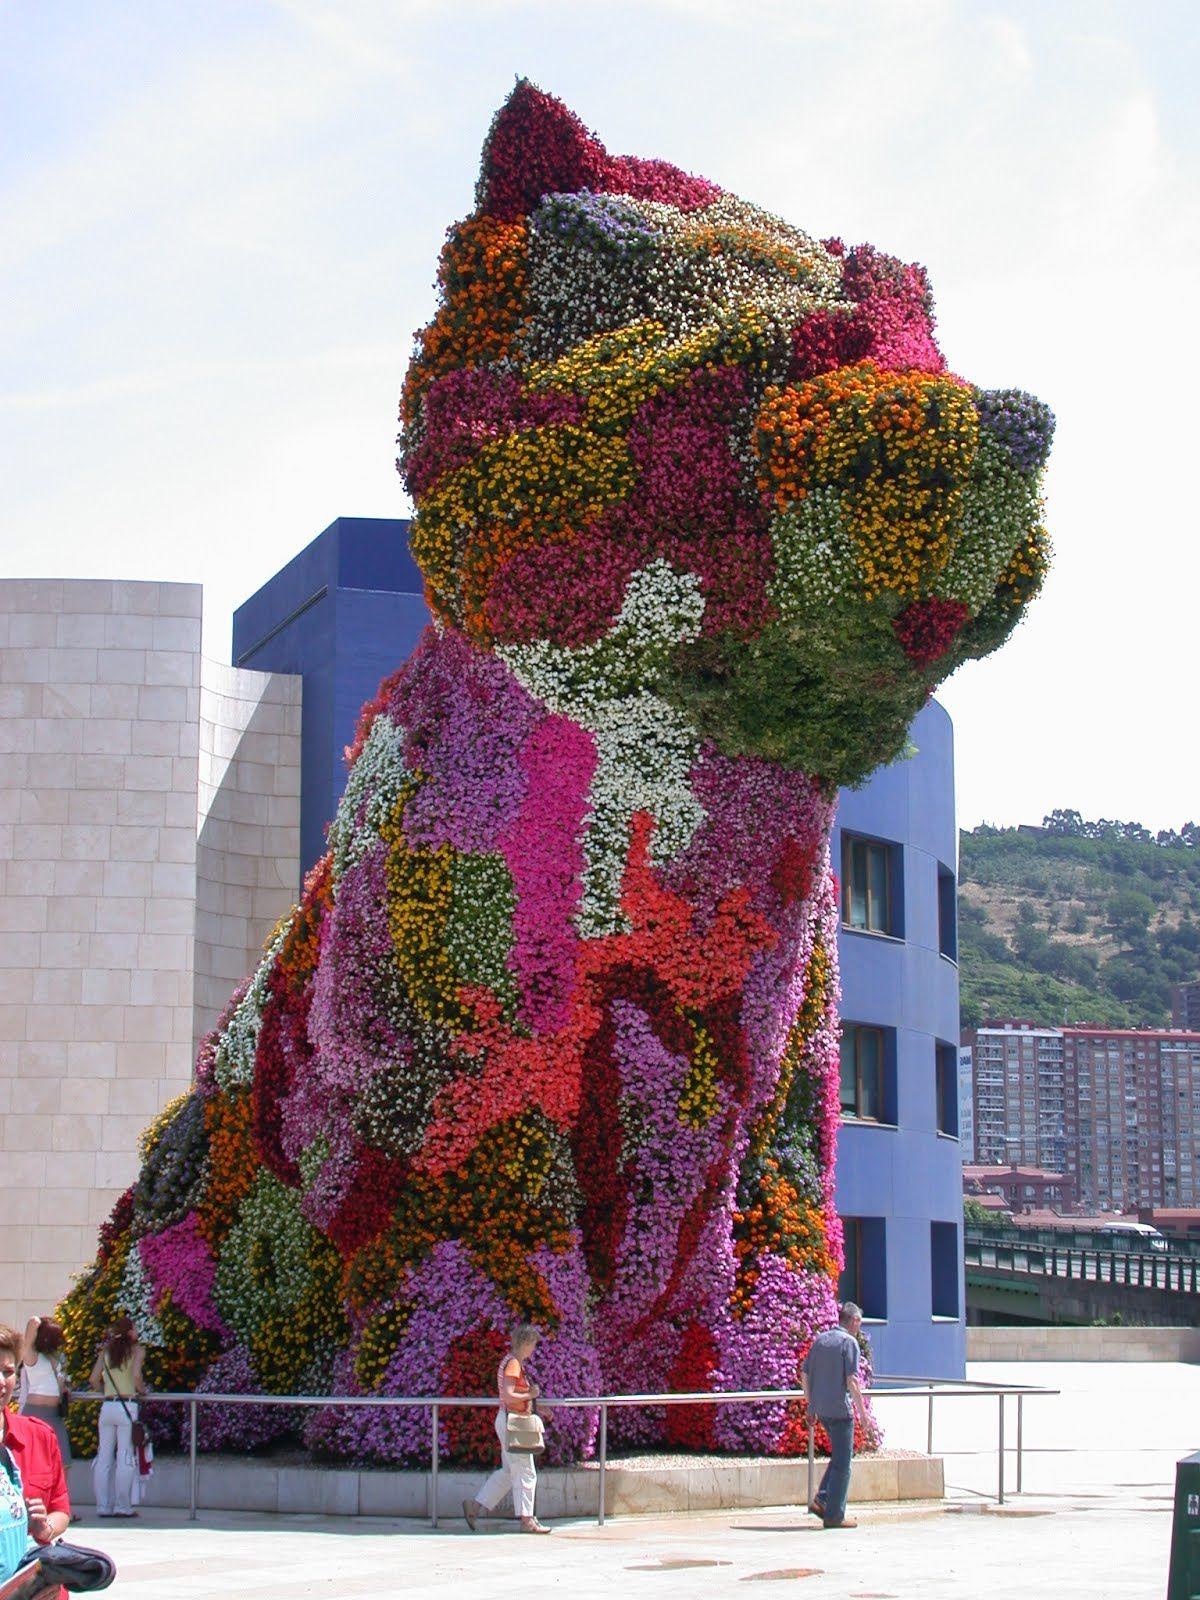 35 Tall Planted Sculpture By Jeff Koons Jeff Koons Jeff Koons Art Public Art